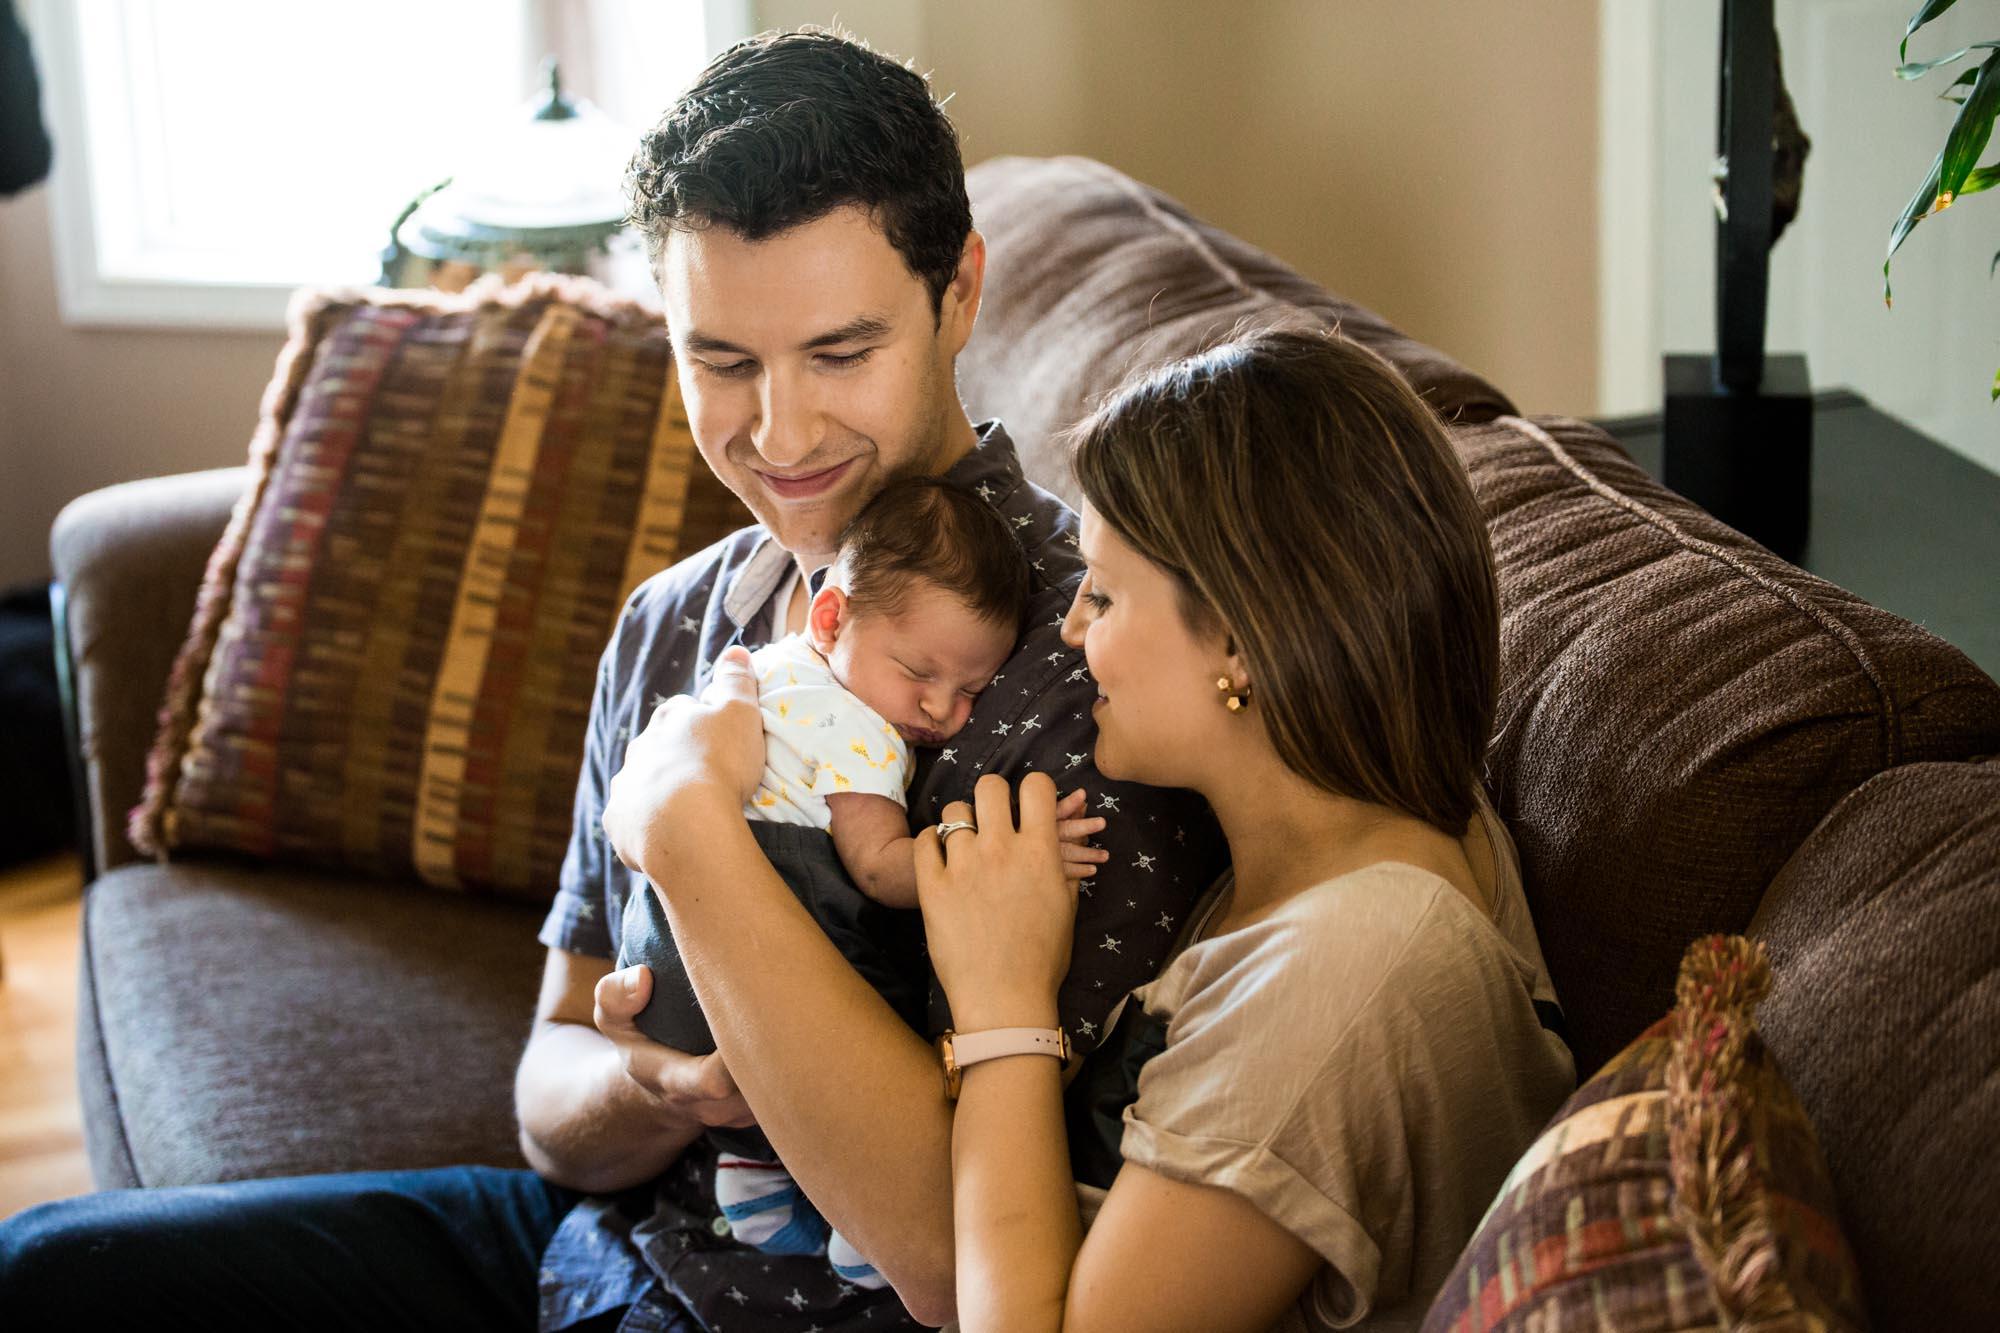 Family newborn photographer, maternity and newborn photography, Calgary